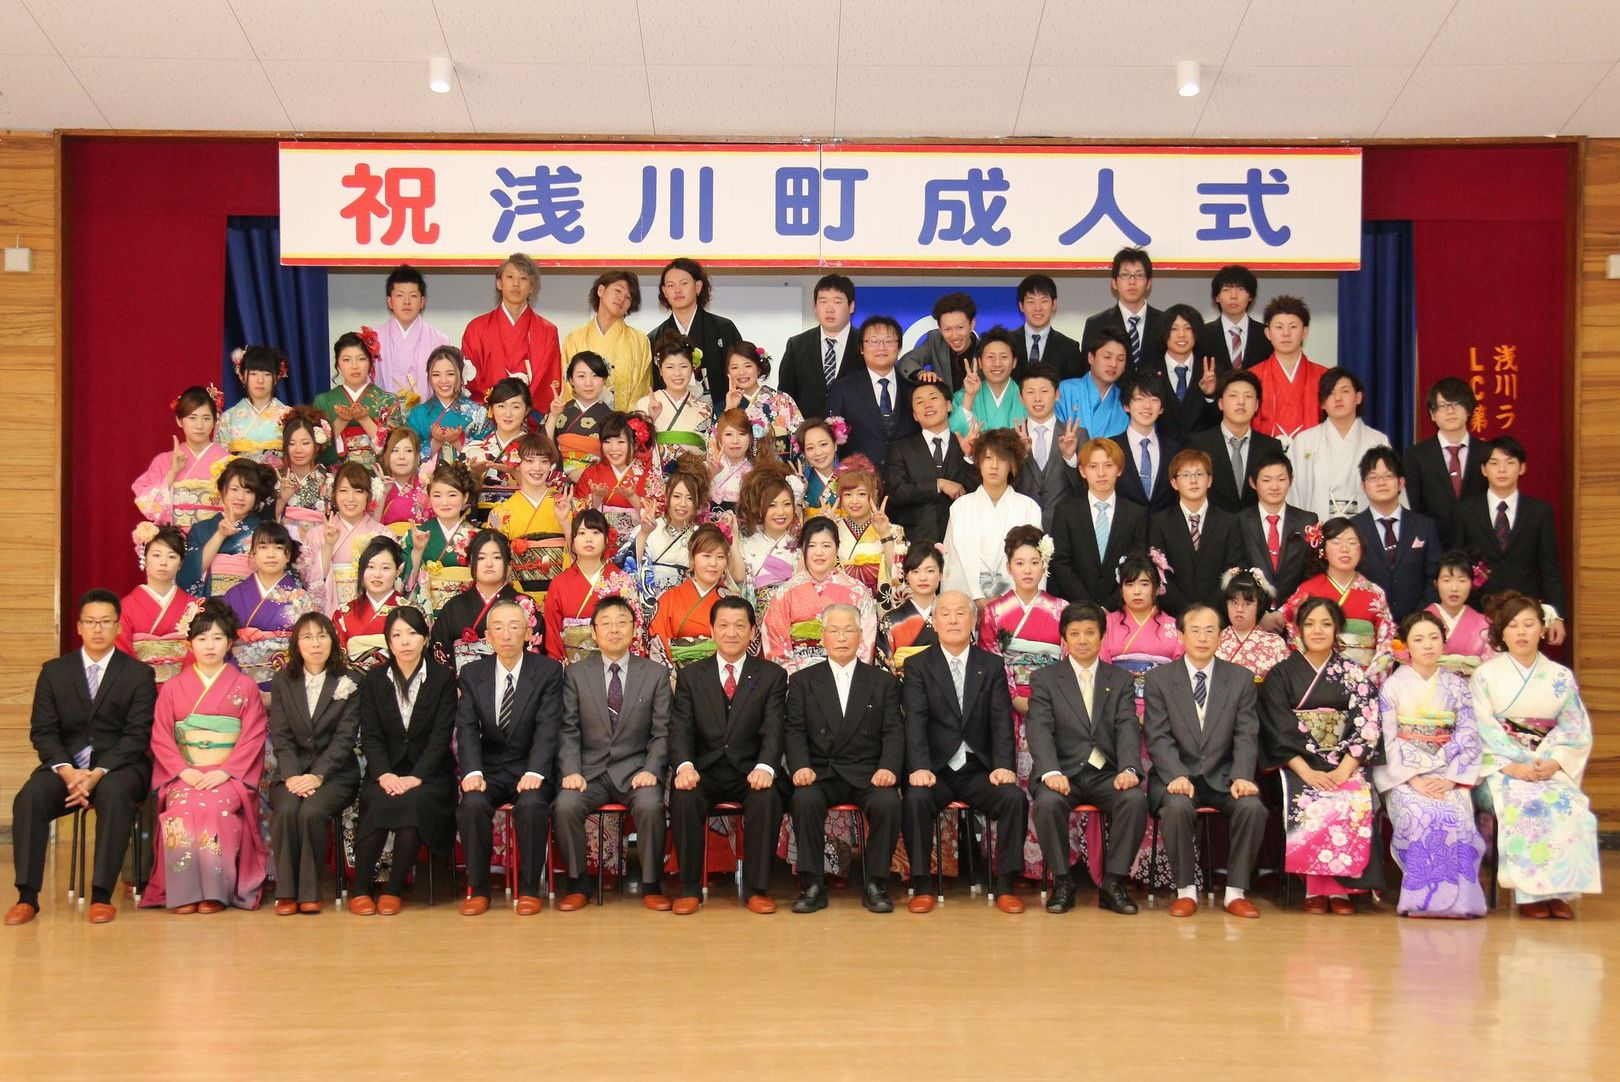 http://www.town.asakawa.fukushima.jp/blog-files/H28Seijinn%289%29.JPG